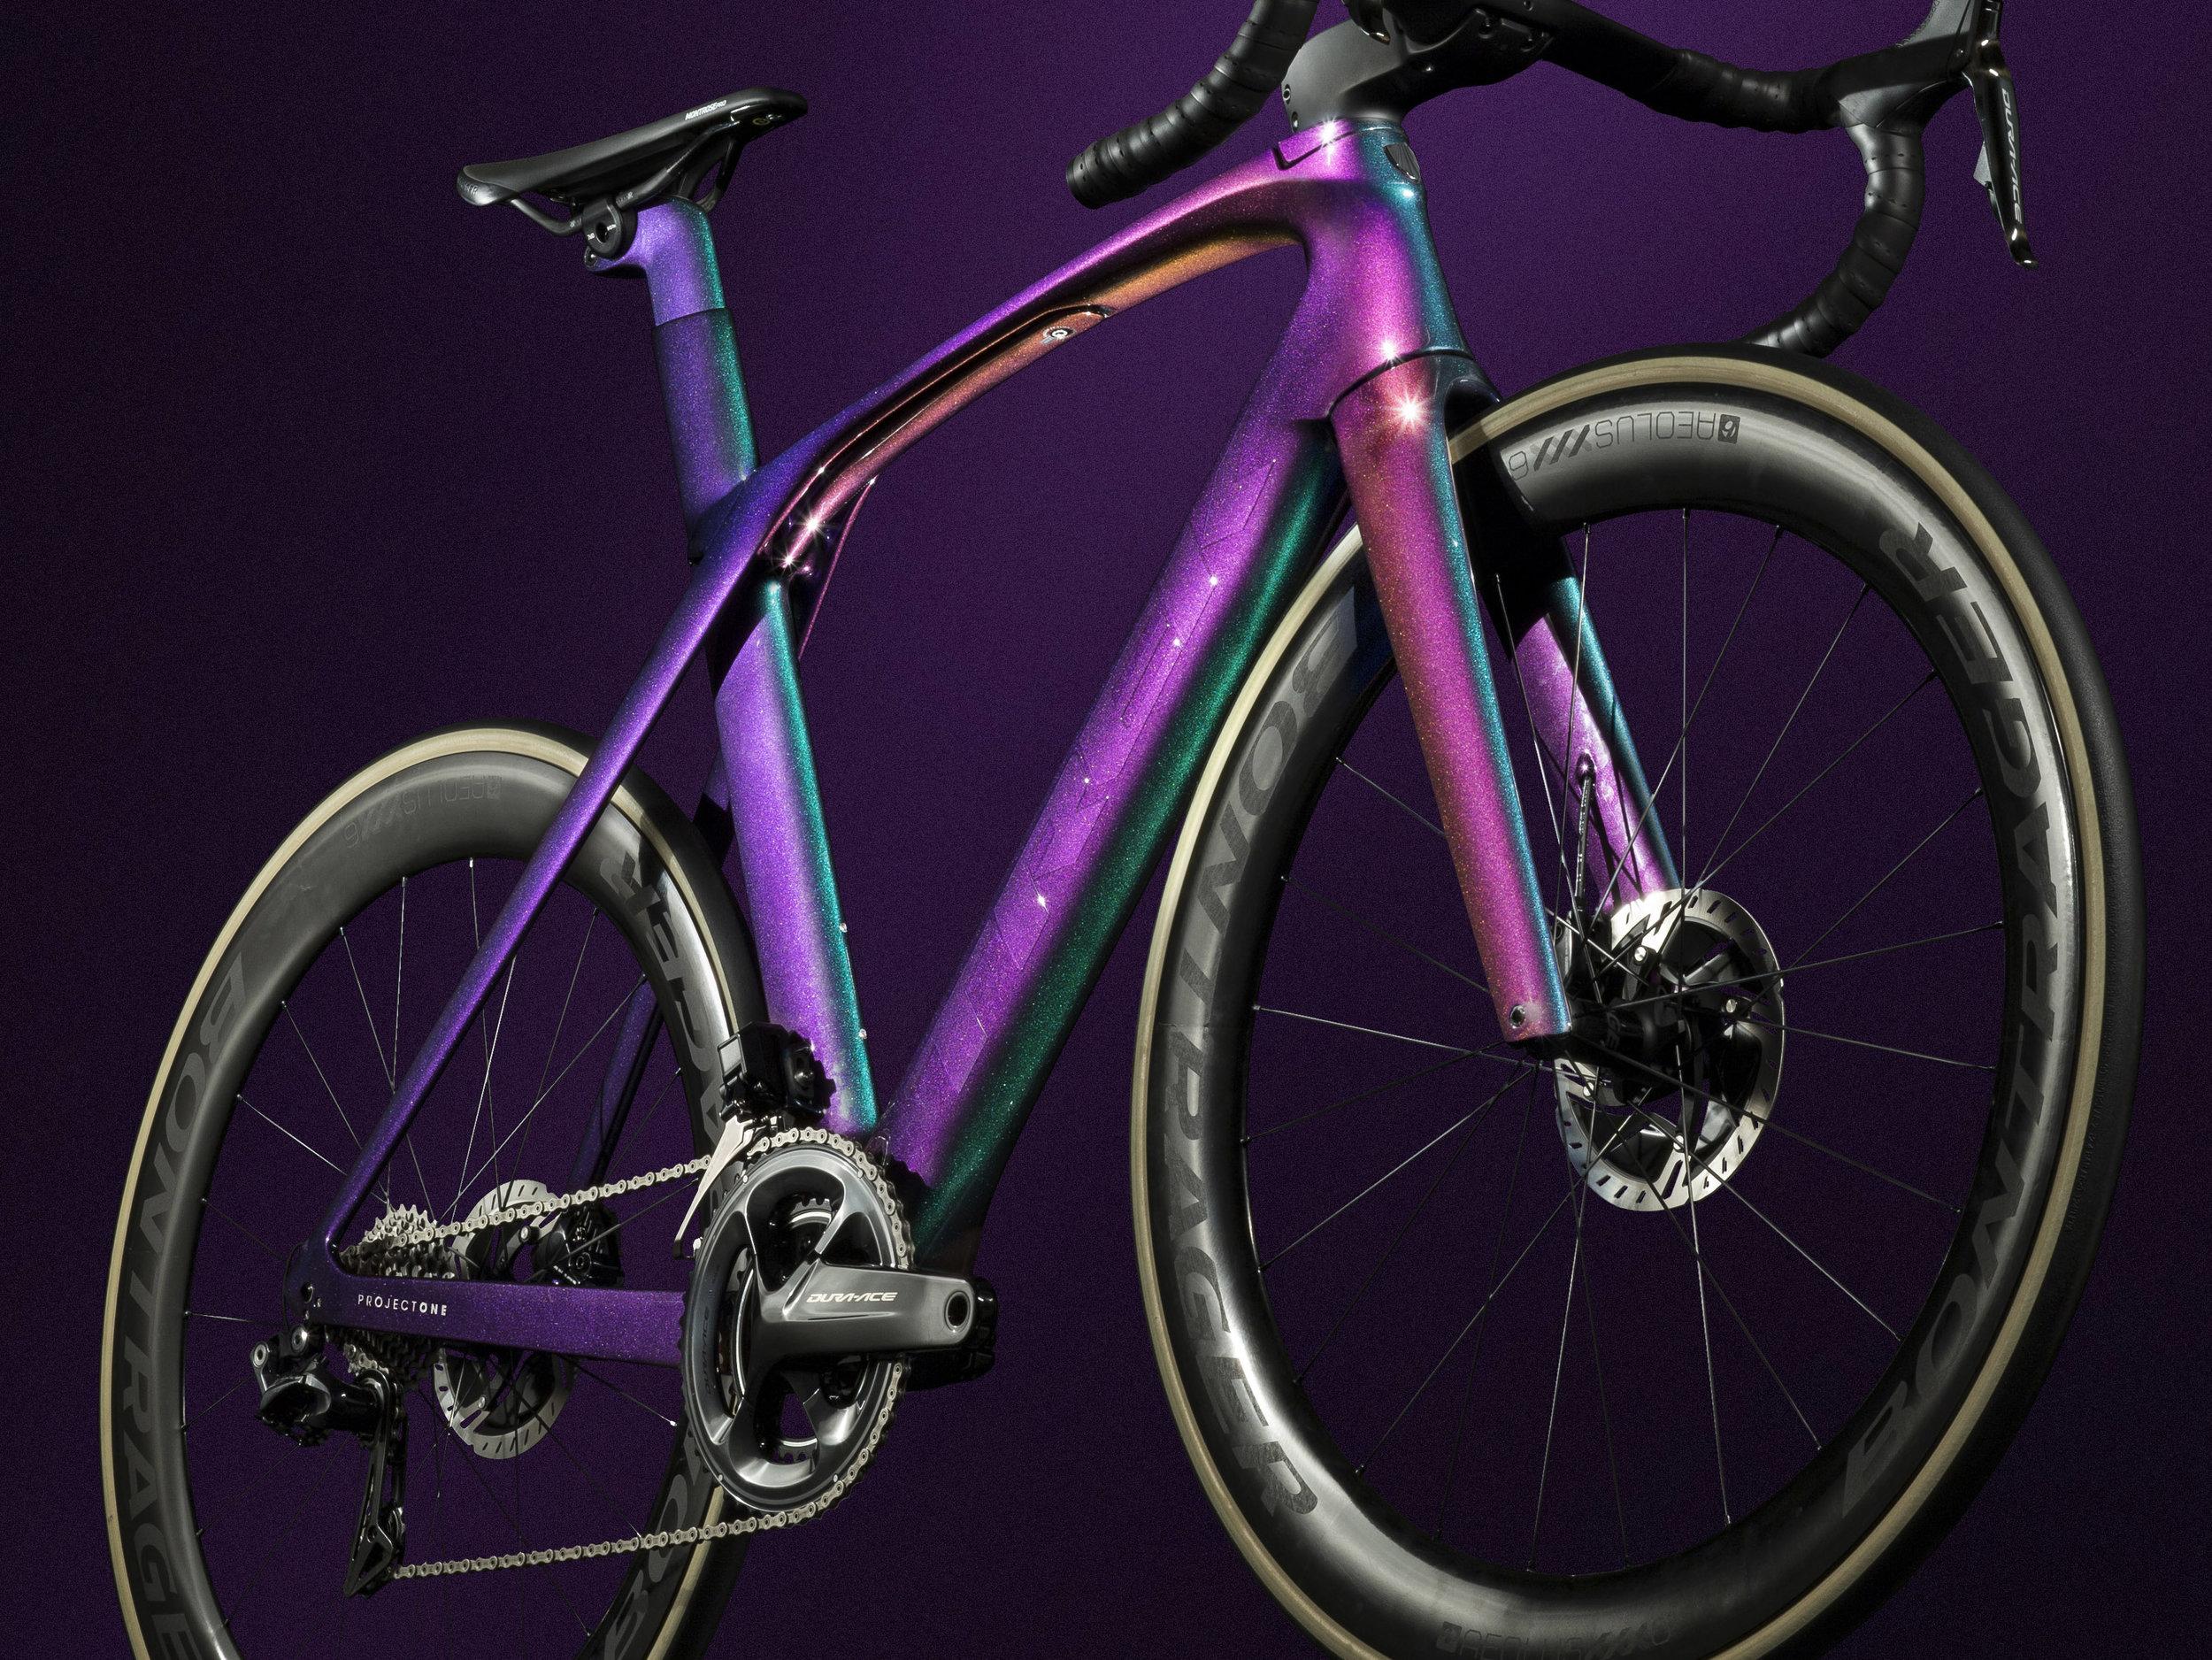 P1_Madone_ICON_Purple_Phaze_low_front_detail.jpg